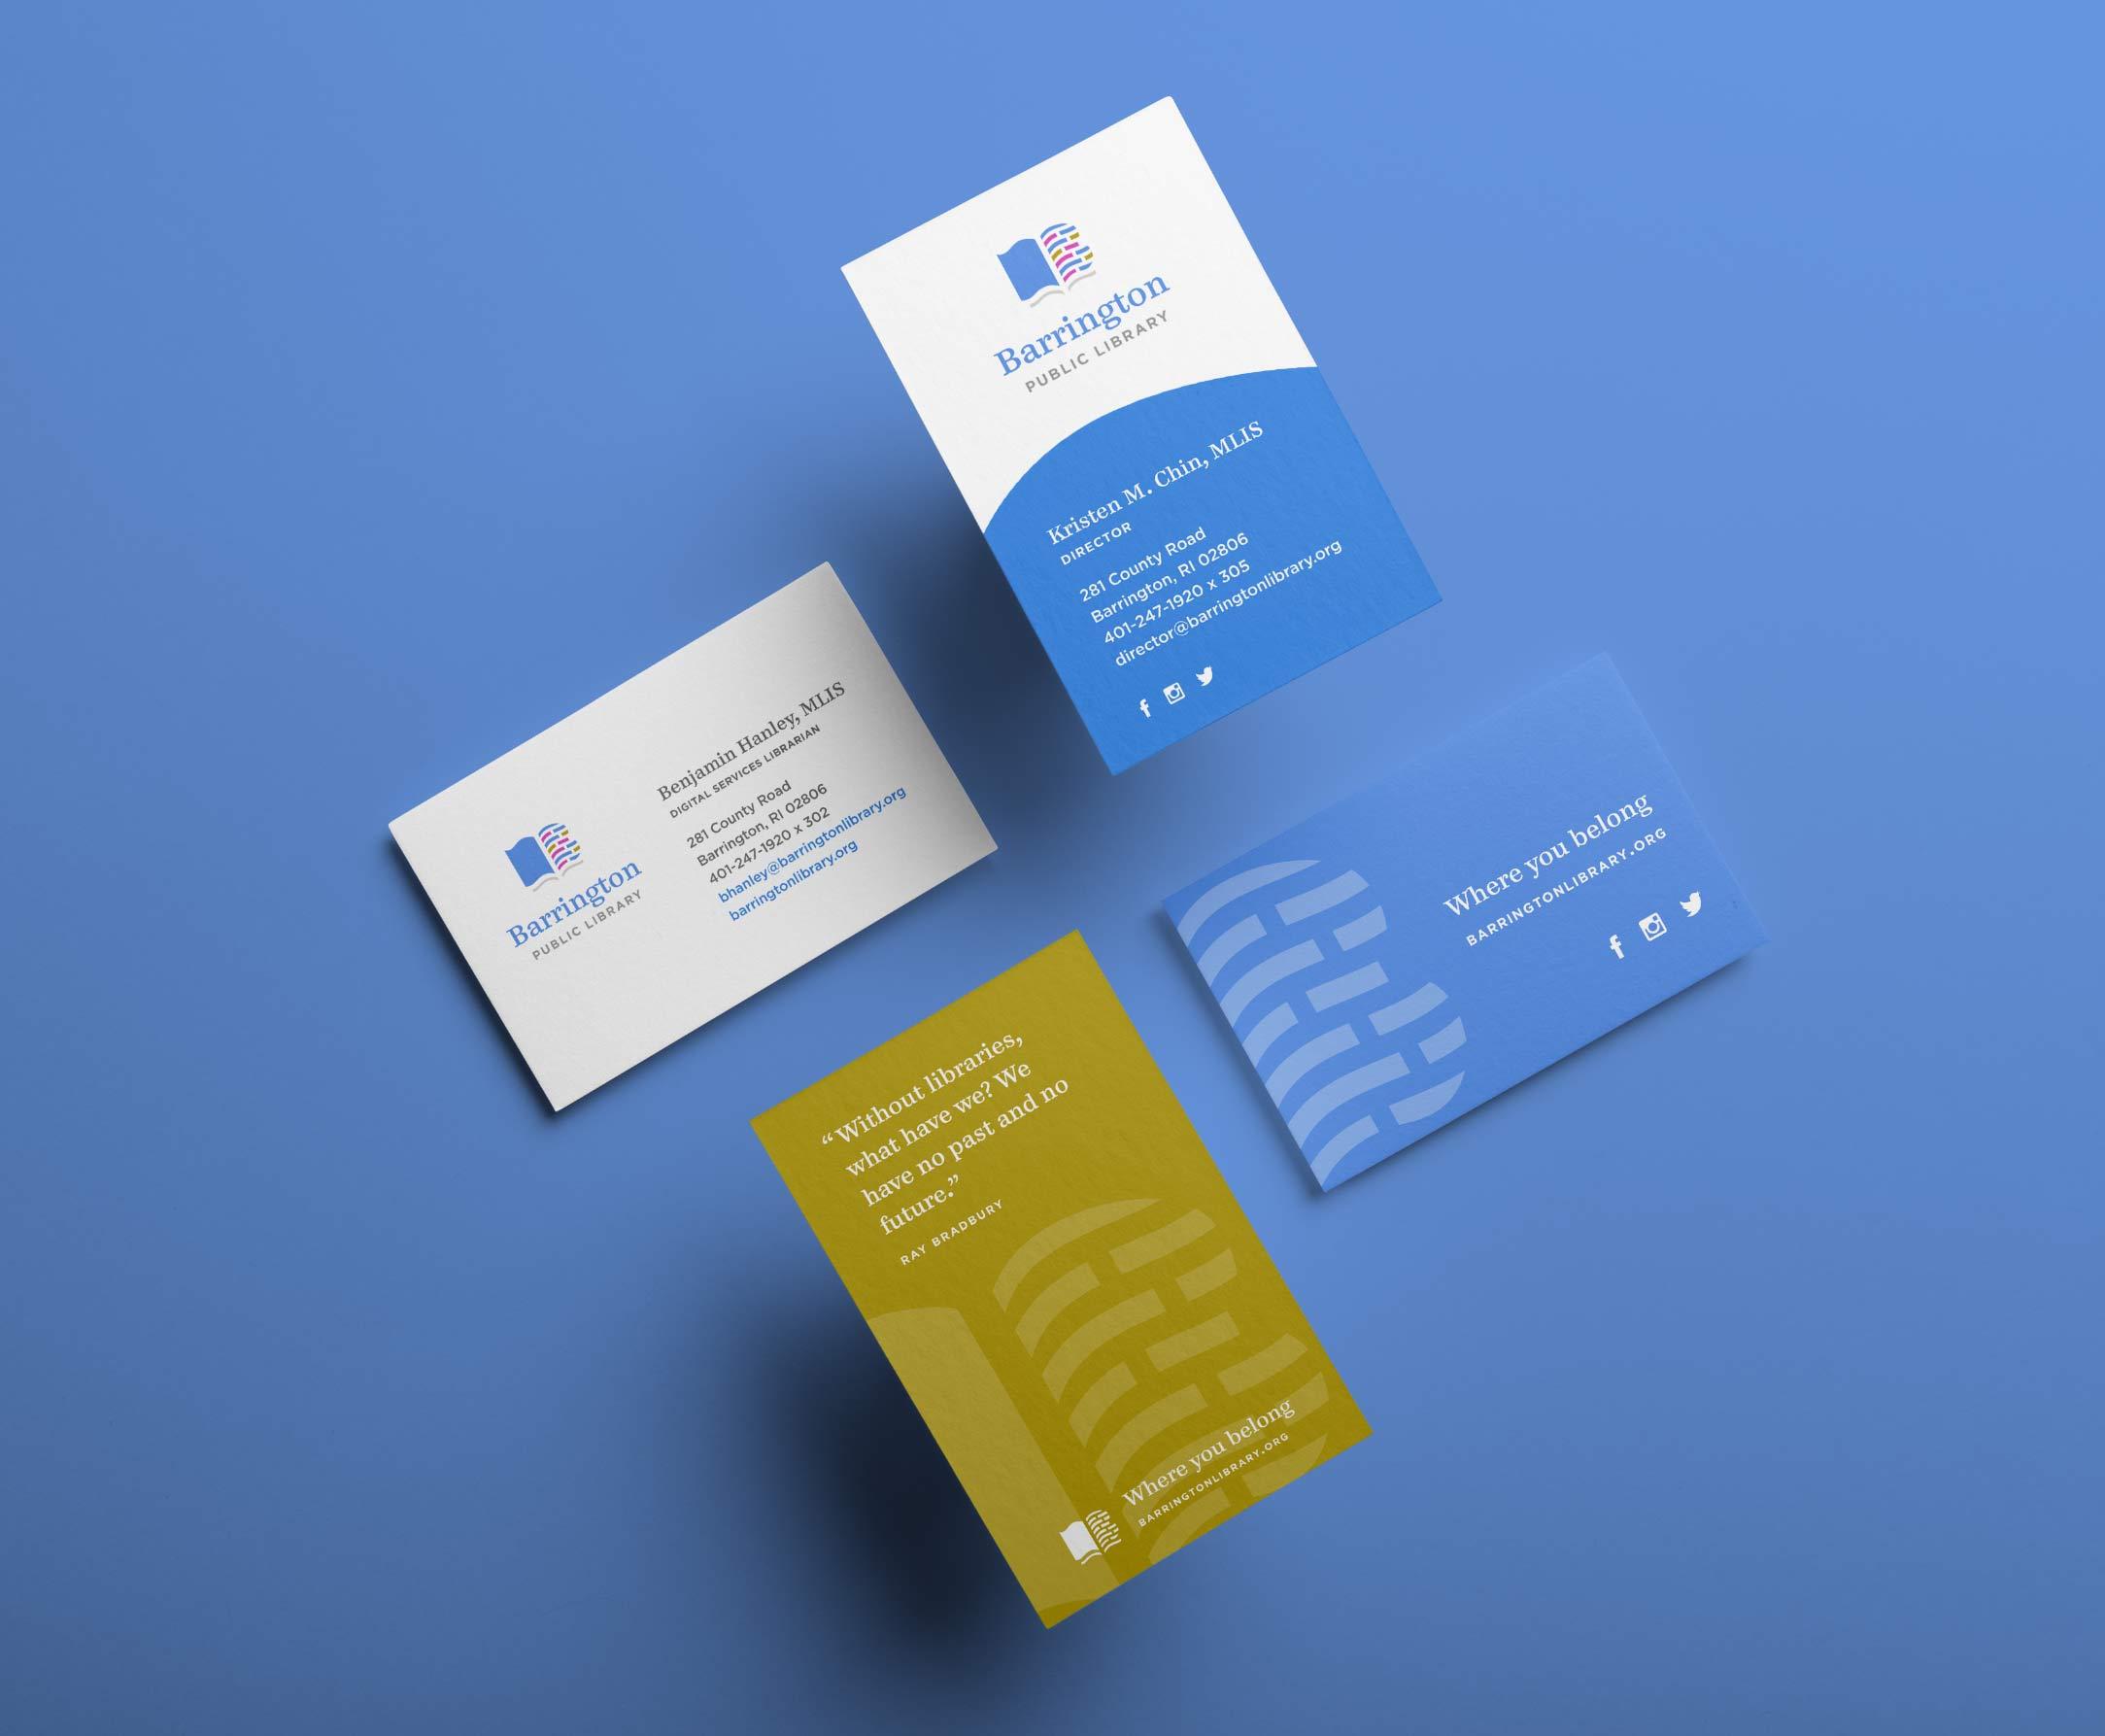 Barrington Public Library business card design